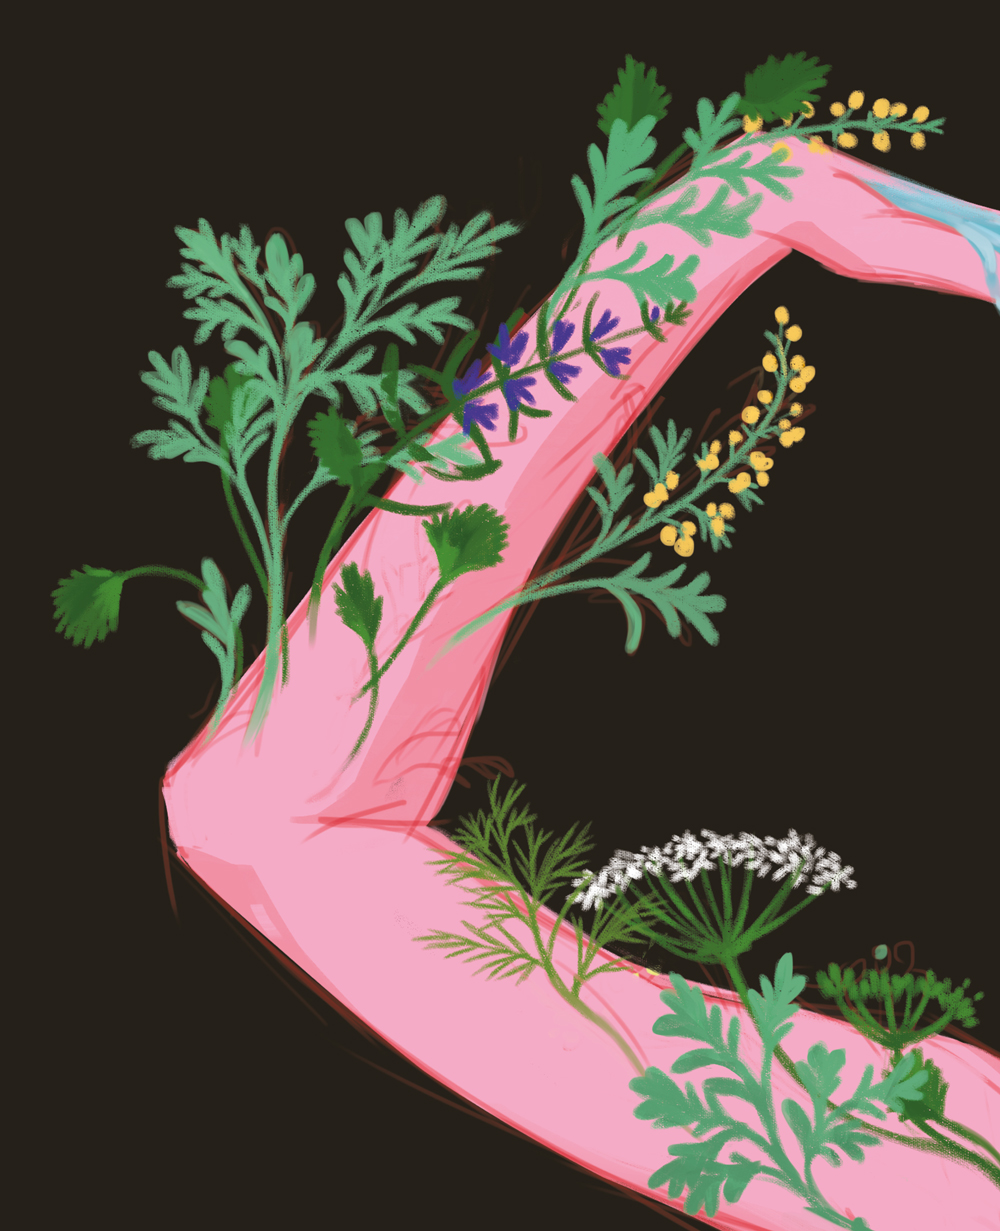 Illustration de Sandrine Pilloud | Absinthe | Exposition pbk9